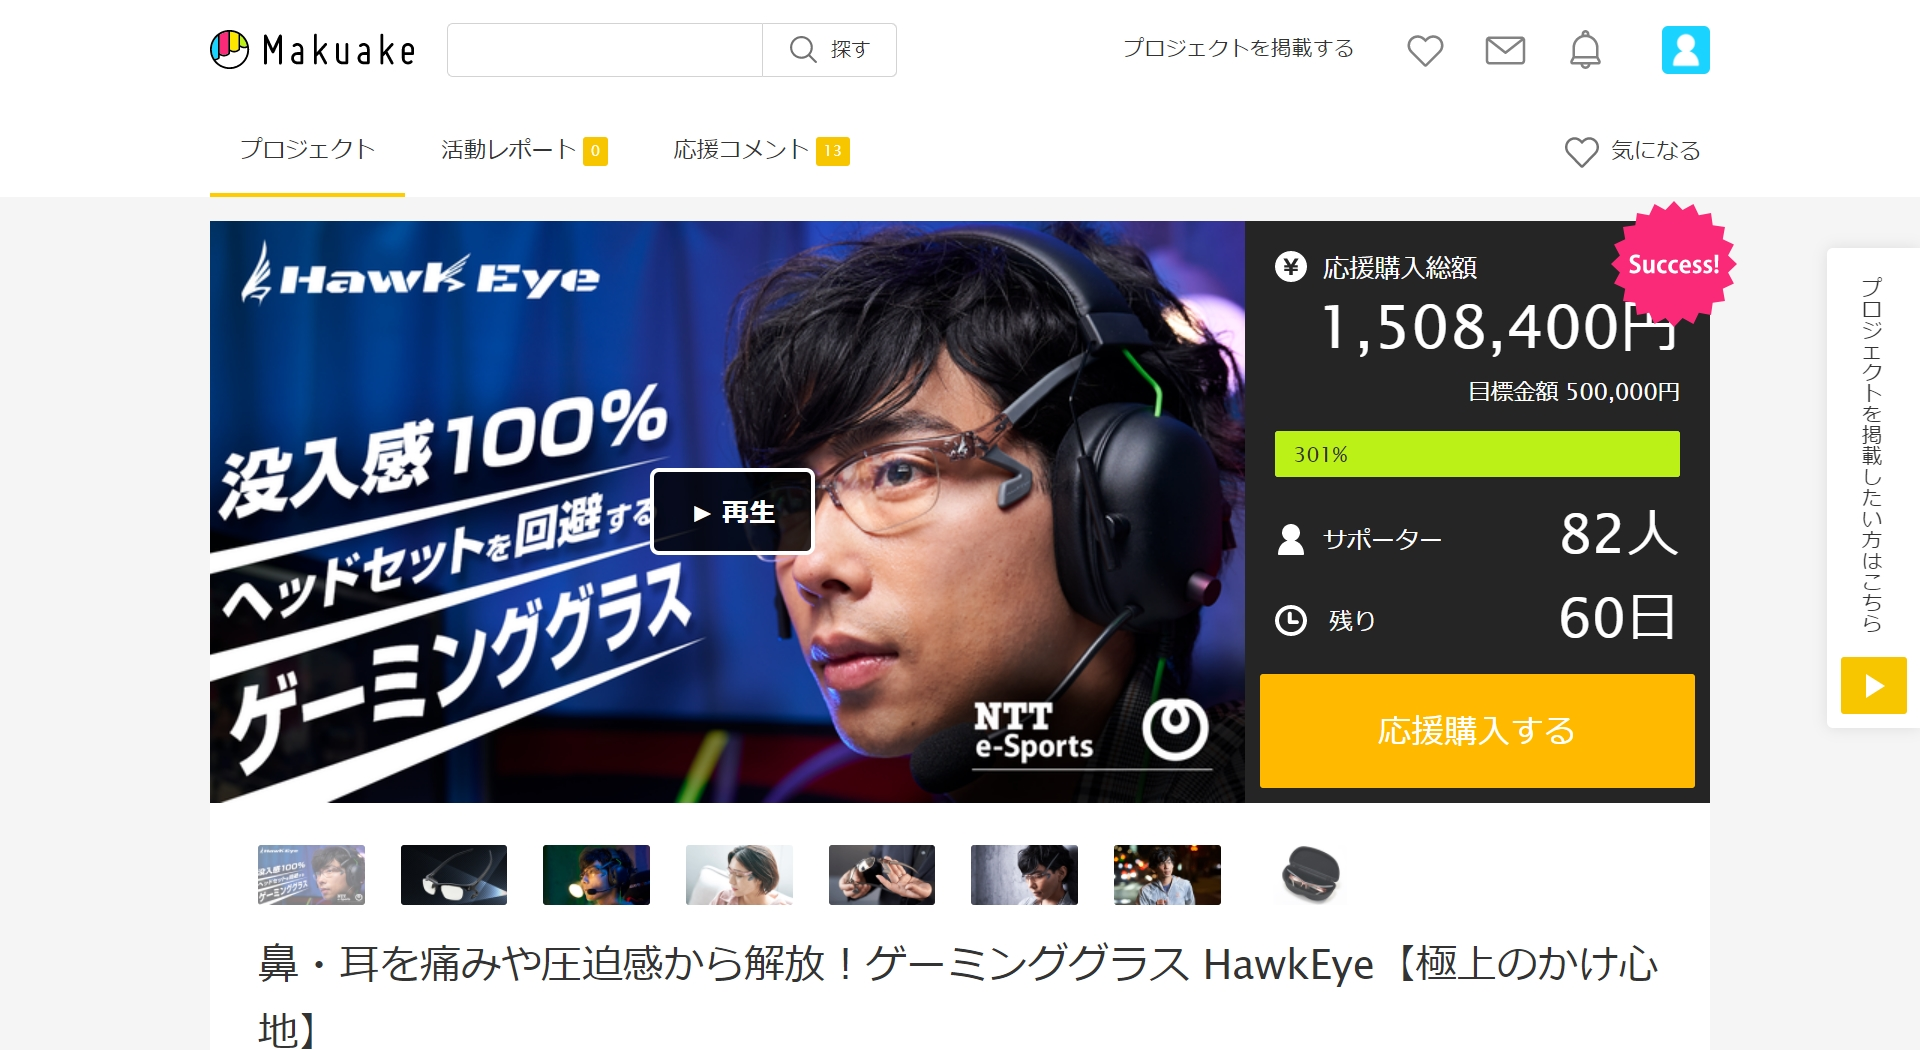 "<a href="" https://www.makuake.com/project/hawkeye/"" class=""n"" target=""_blank"">Makuake内にある「HawkEye」のページ</a>。原稿執筆中も購入者は増え続け、18時30分時点で85人に達していた"